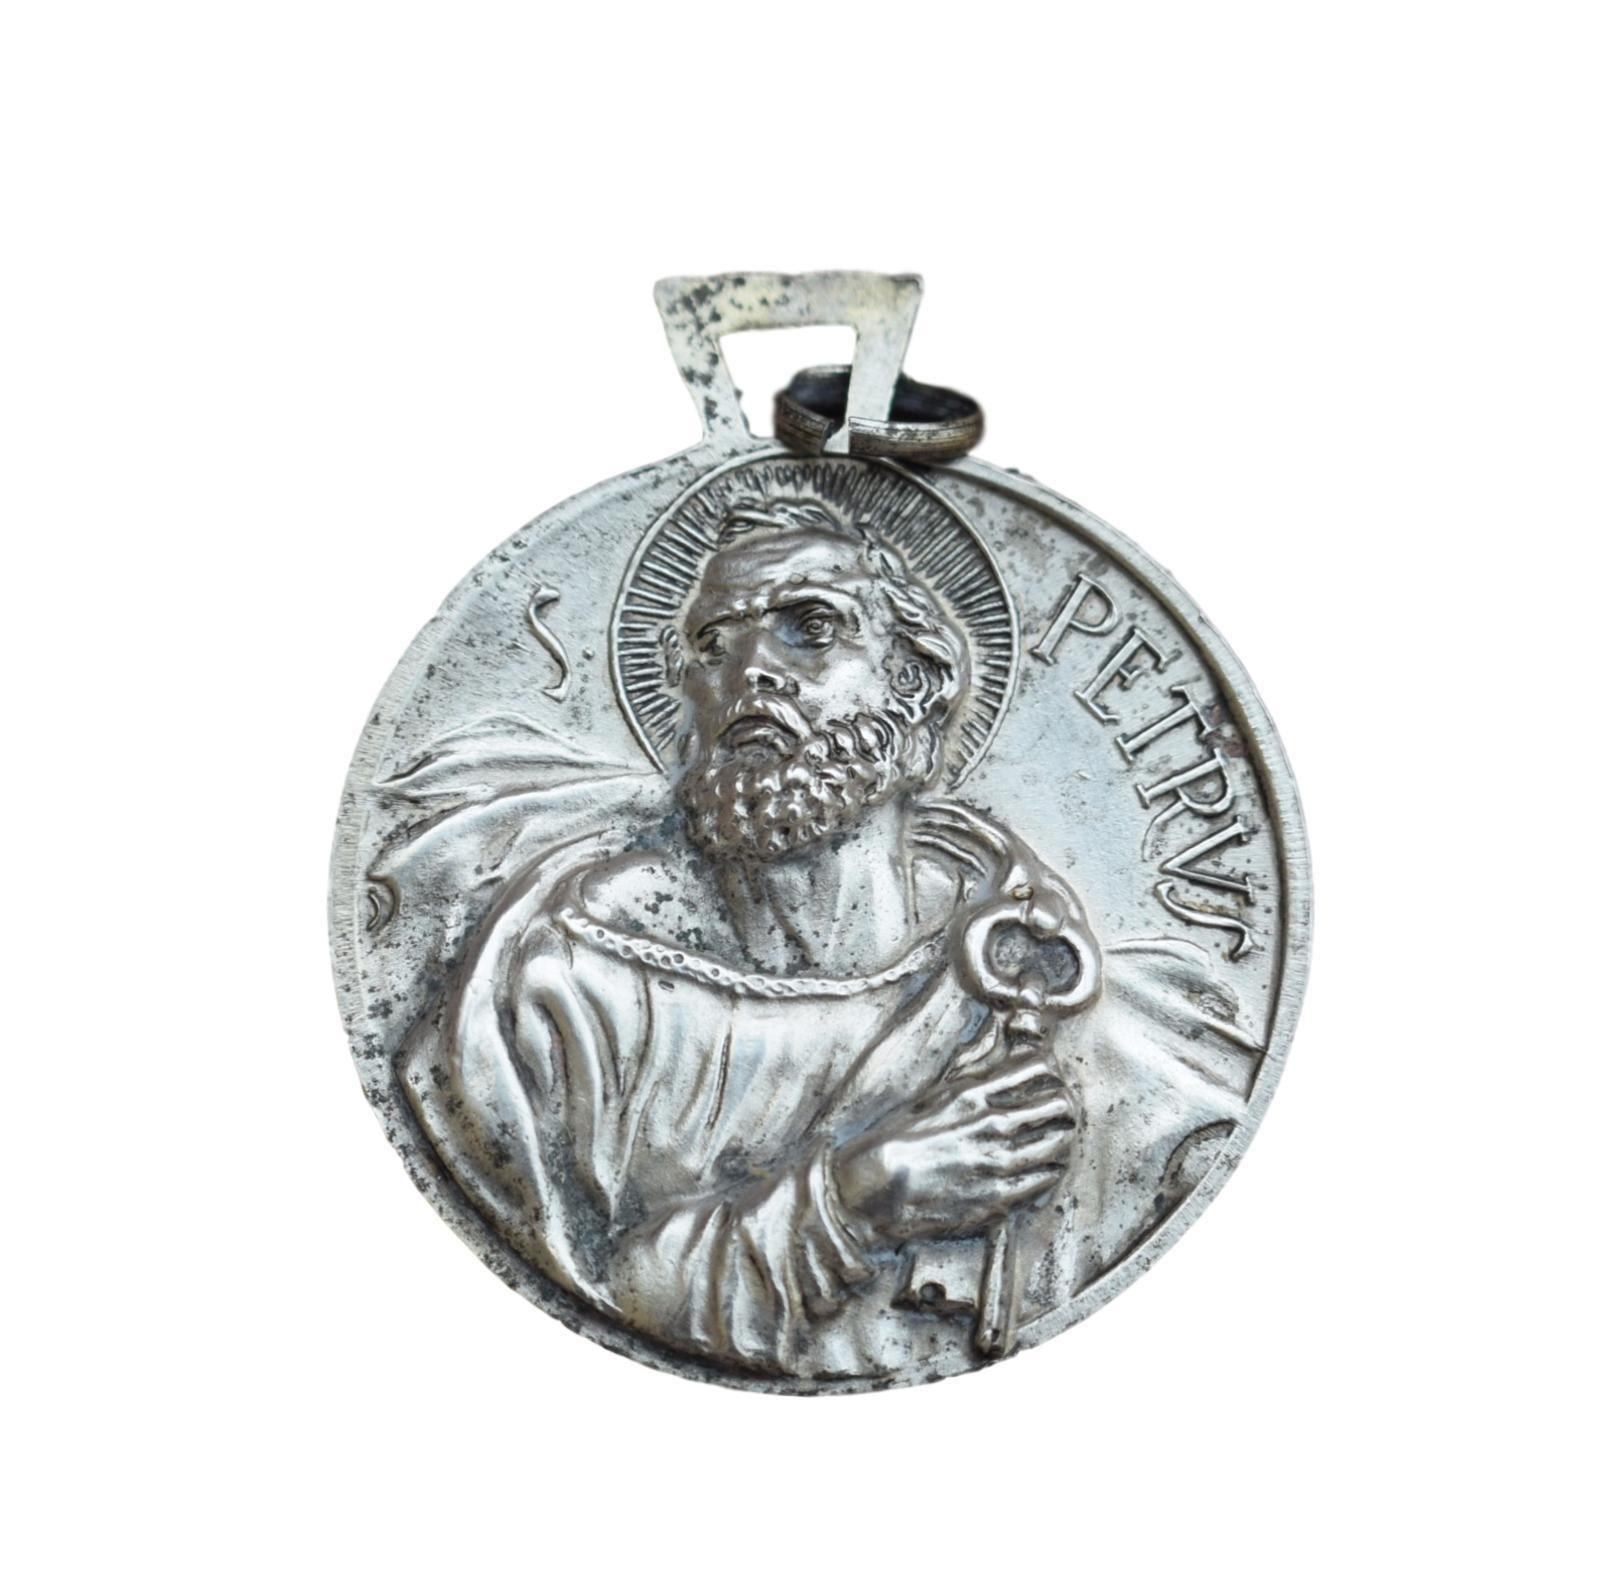 St peter medal saint peter pope john xxiii medal italian antique large religious medal pendant charm aloadofball Images